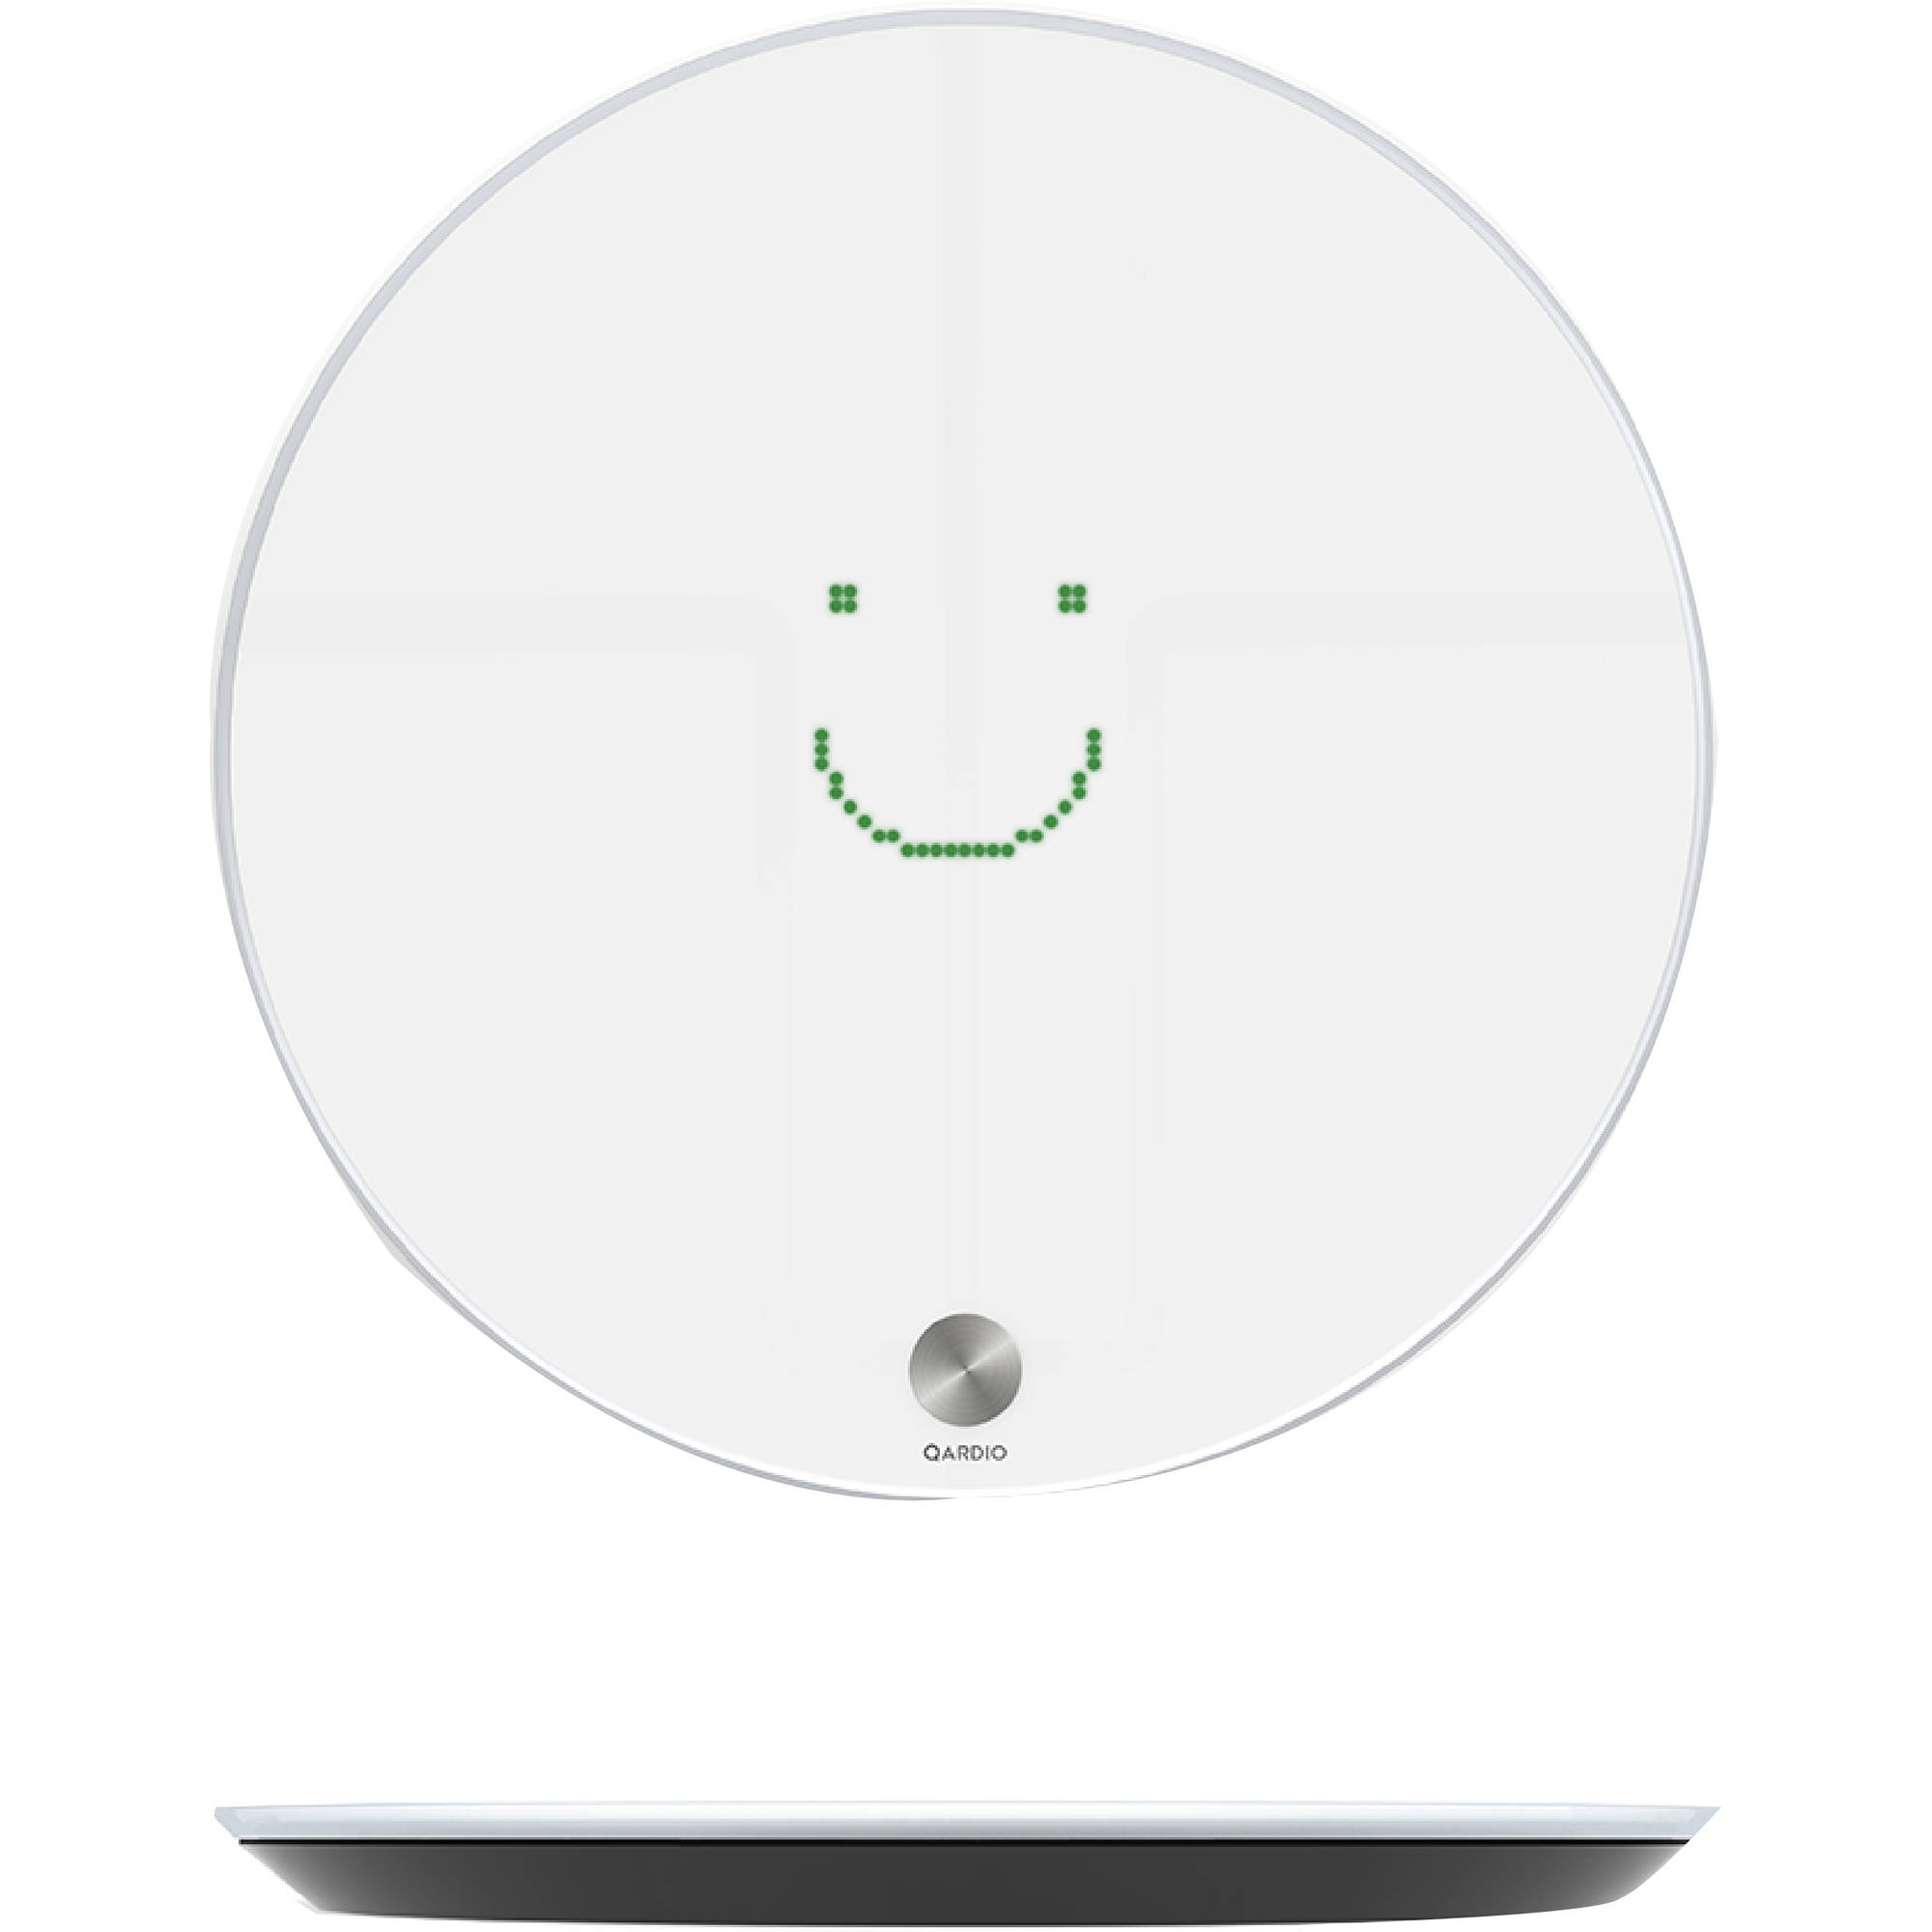 QardioBase Wireless Smart Scale - Walmart.com